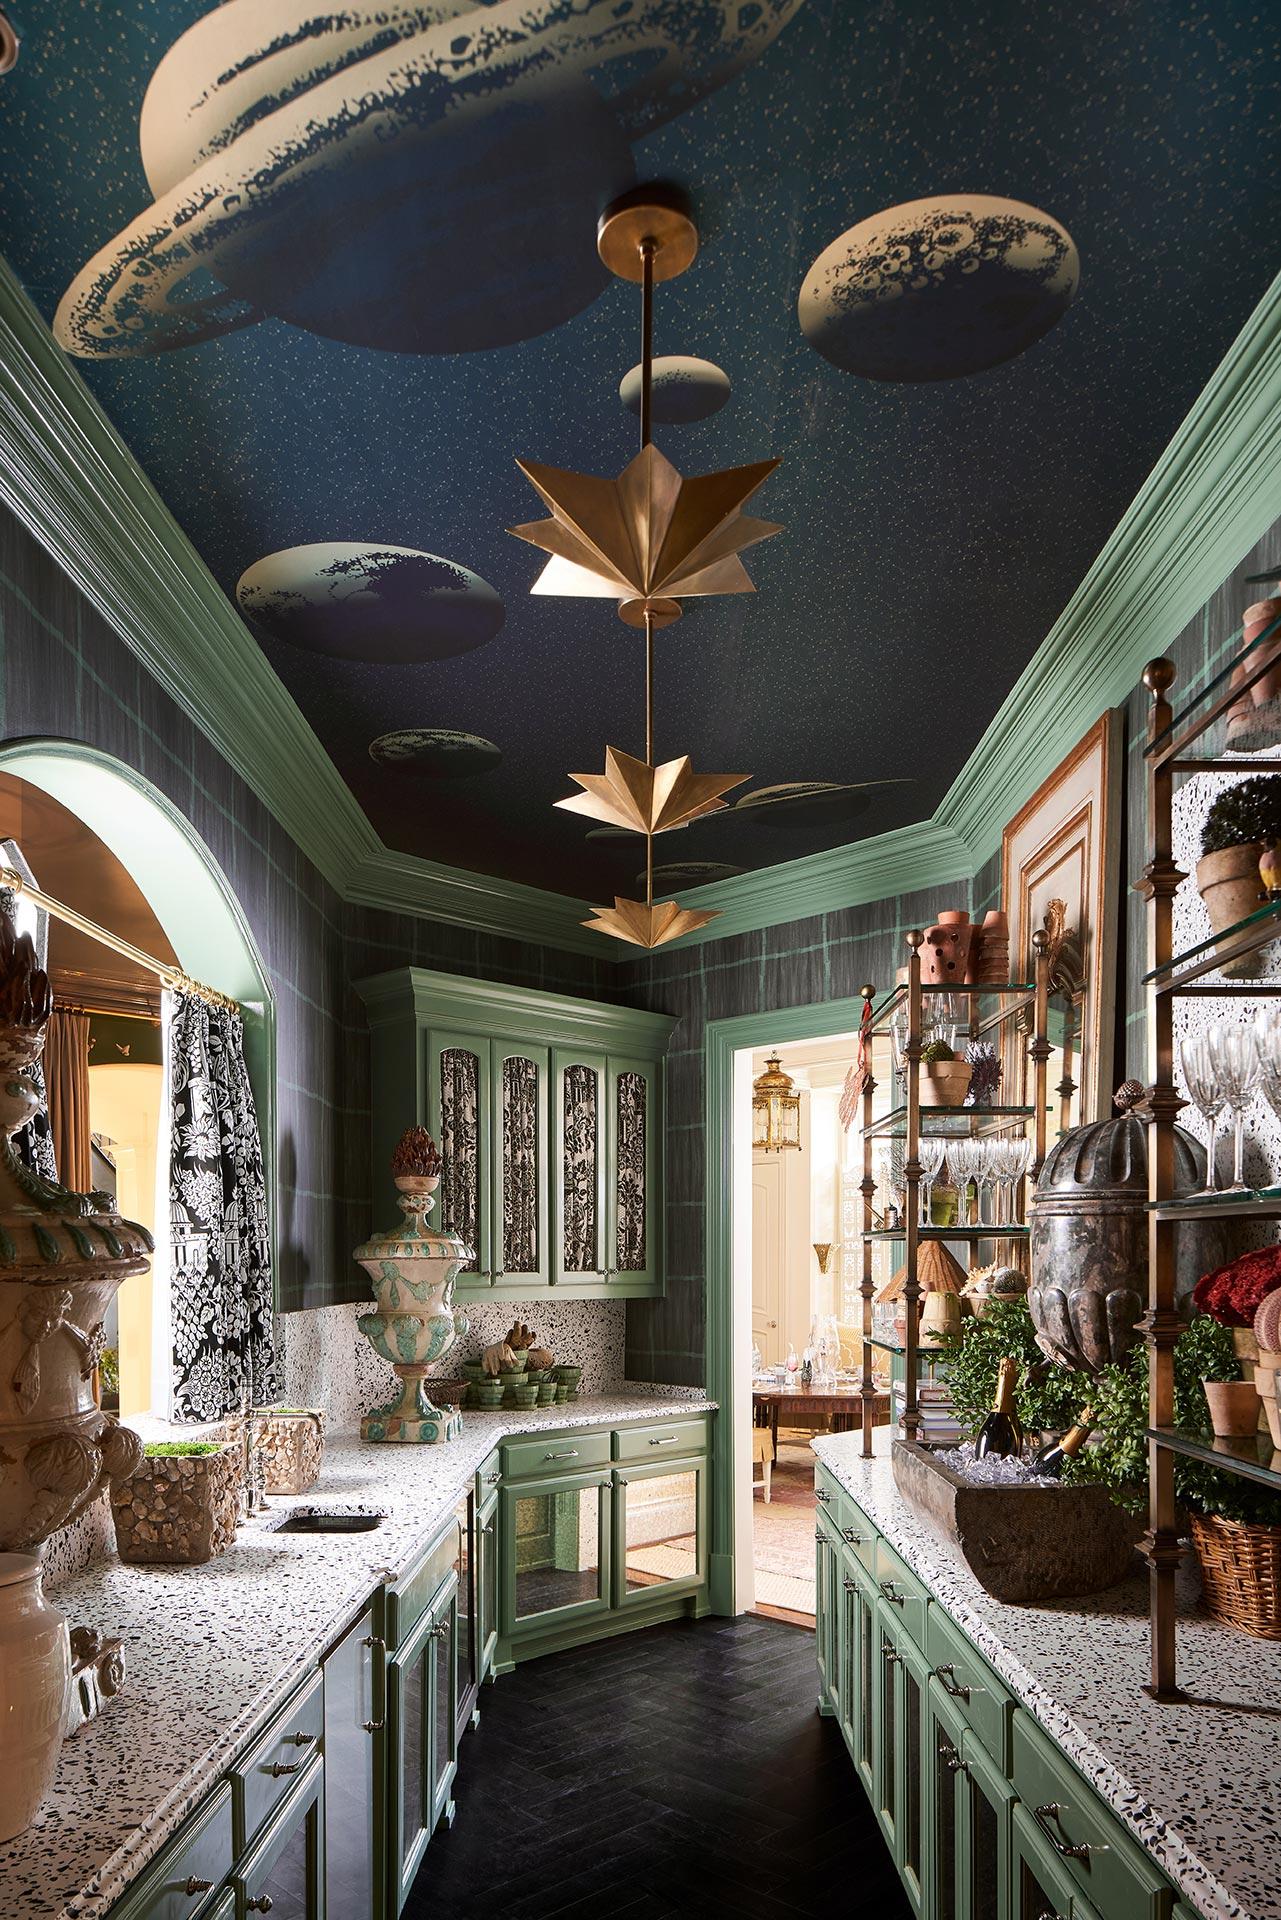 Kitchen Design Photos And Design Ideas